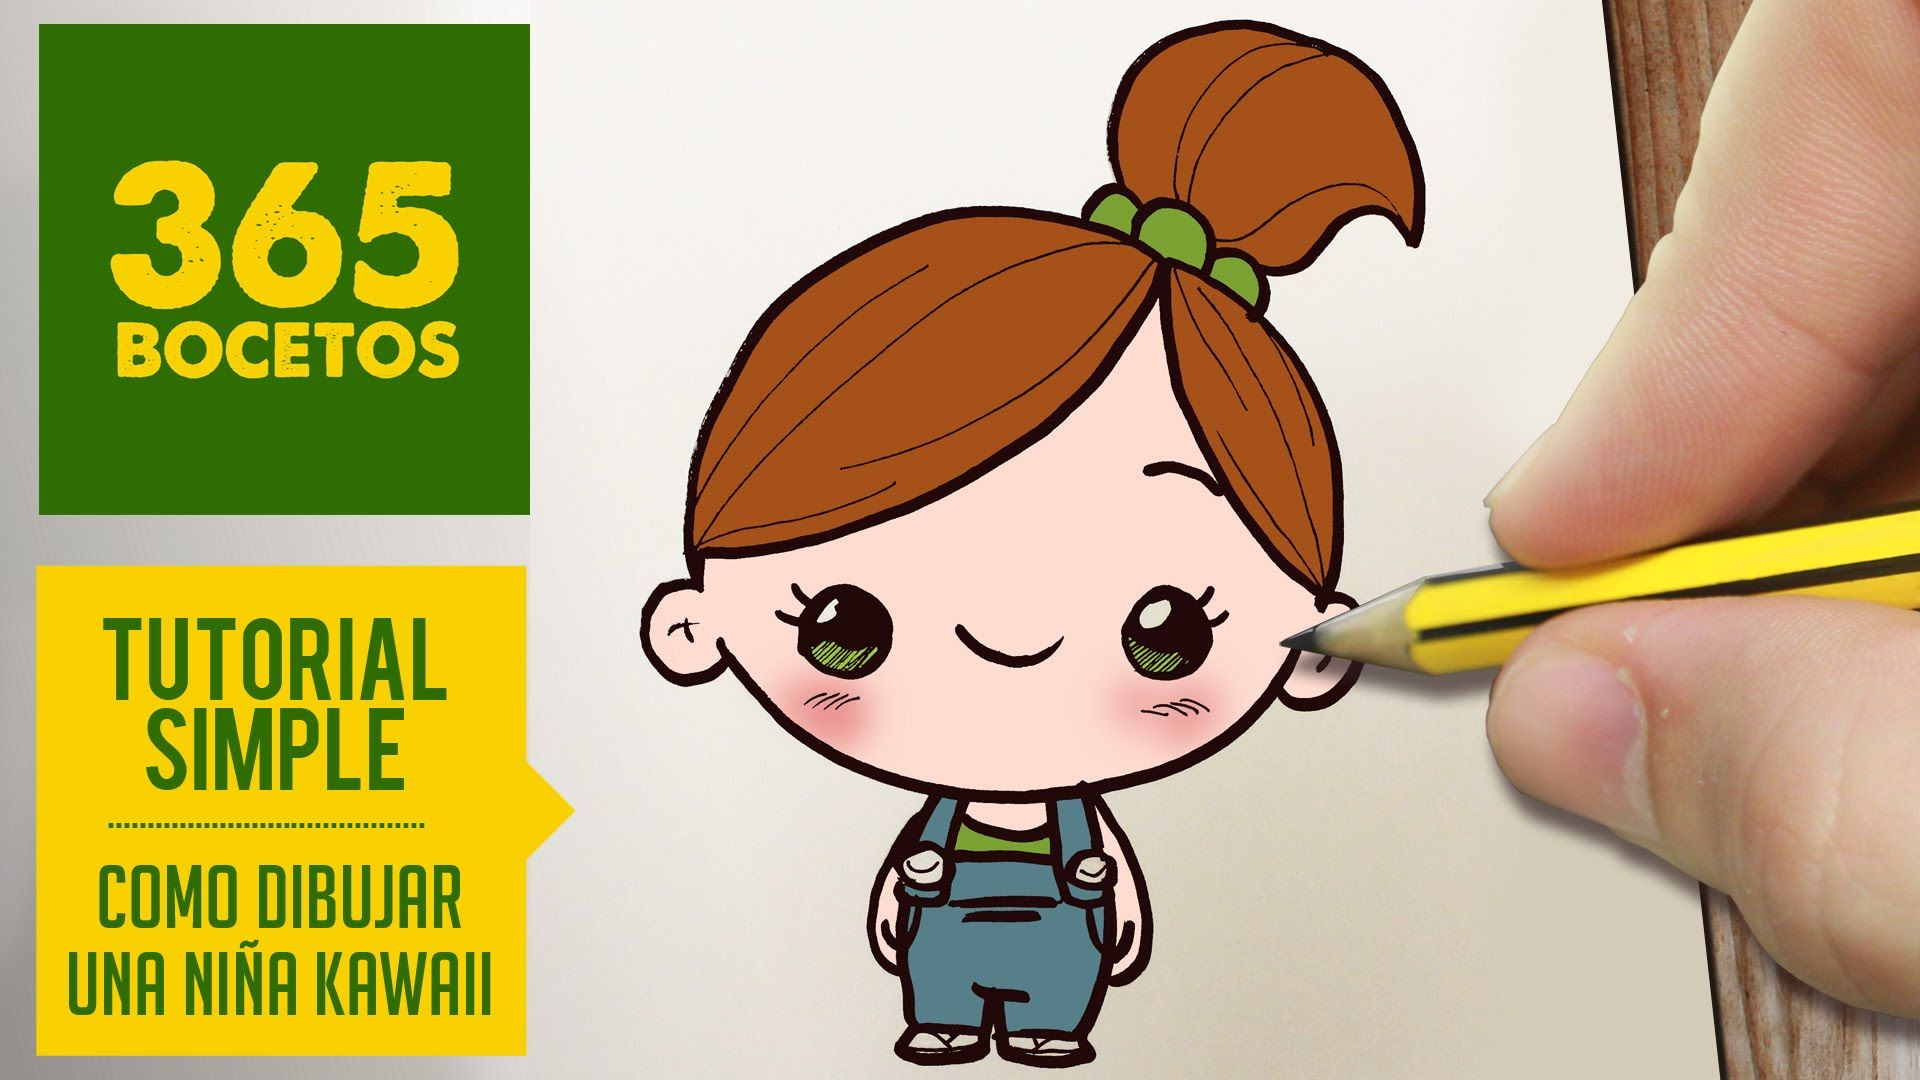 Como Dibujar Una Nina Kawaii Paso A Paso Dibujos Kawaii Faciles How To Draw A Girl Como Dibujar Ninos Dibujos Kawaii Dibujos Kawaii Faciles